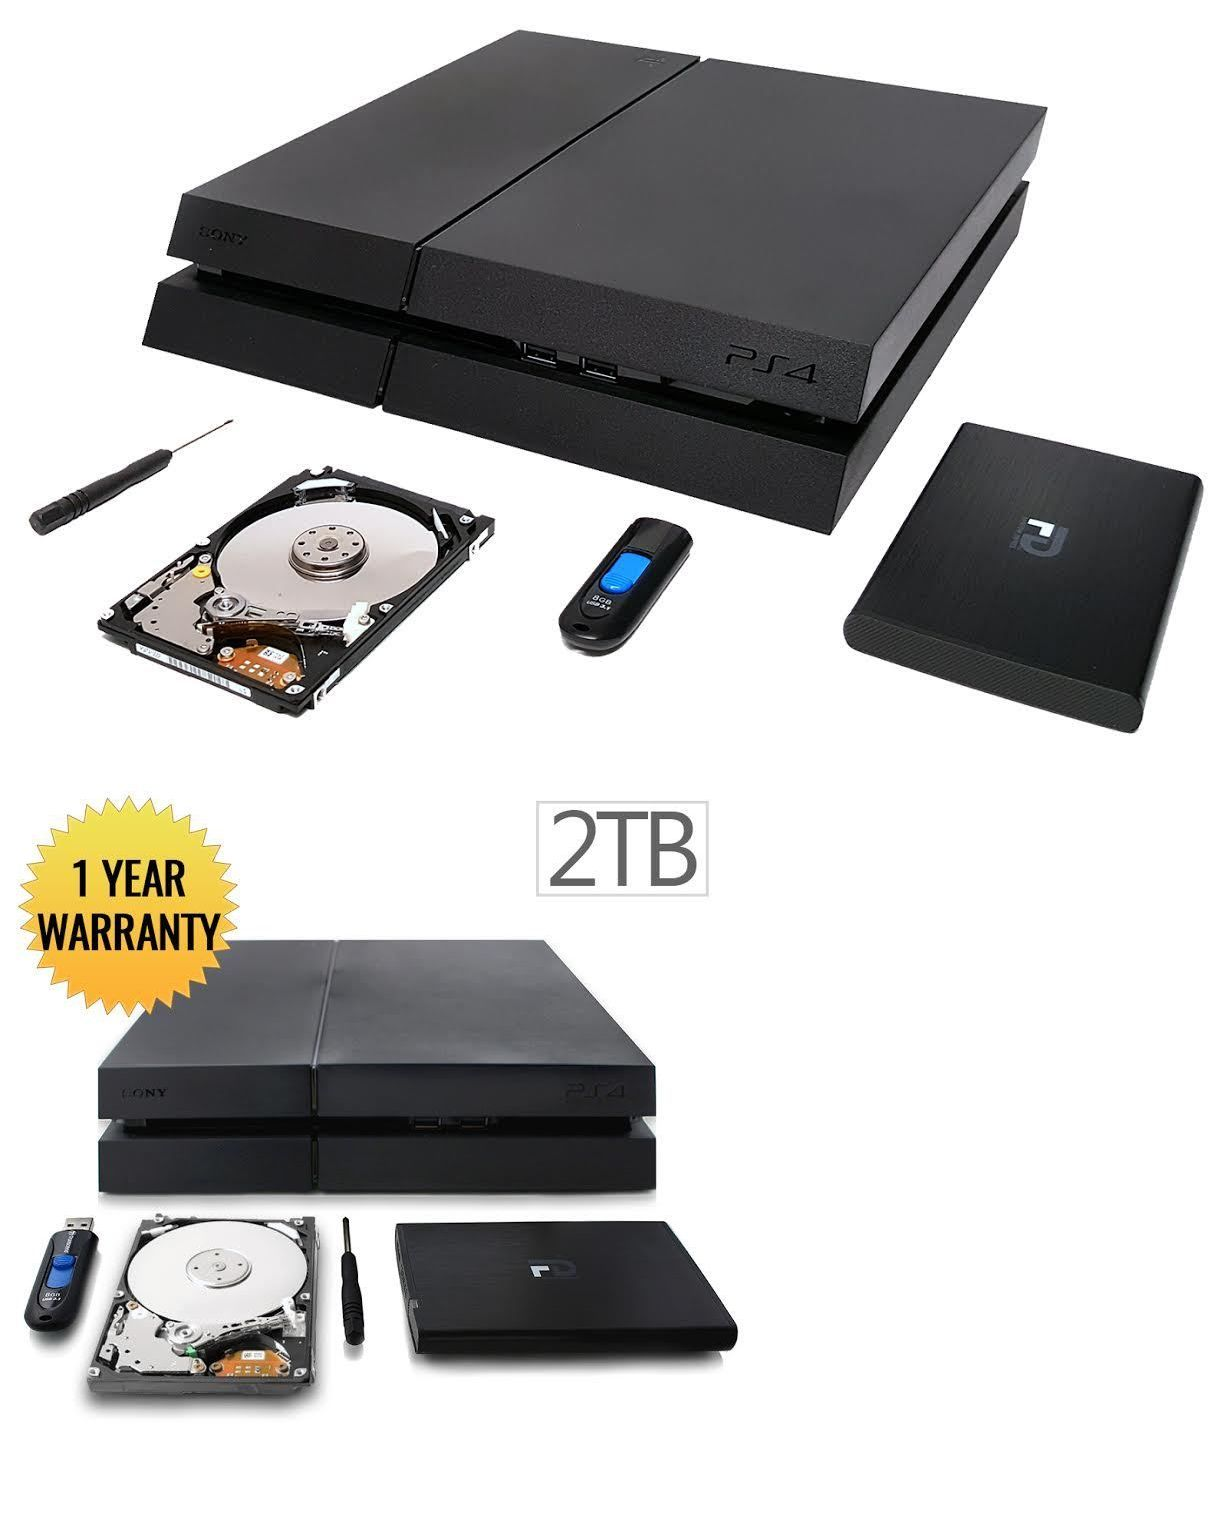 Hard Drives 171820: 2Tb Hard Drive Upgrade Kit For